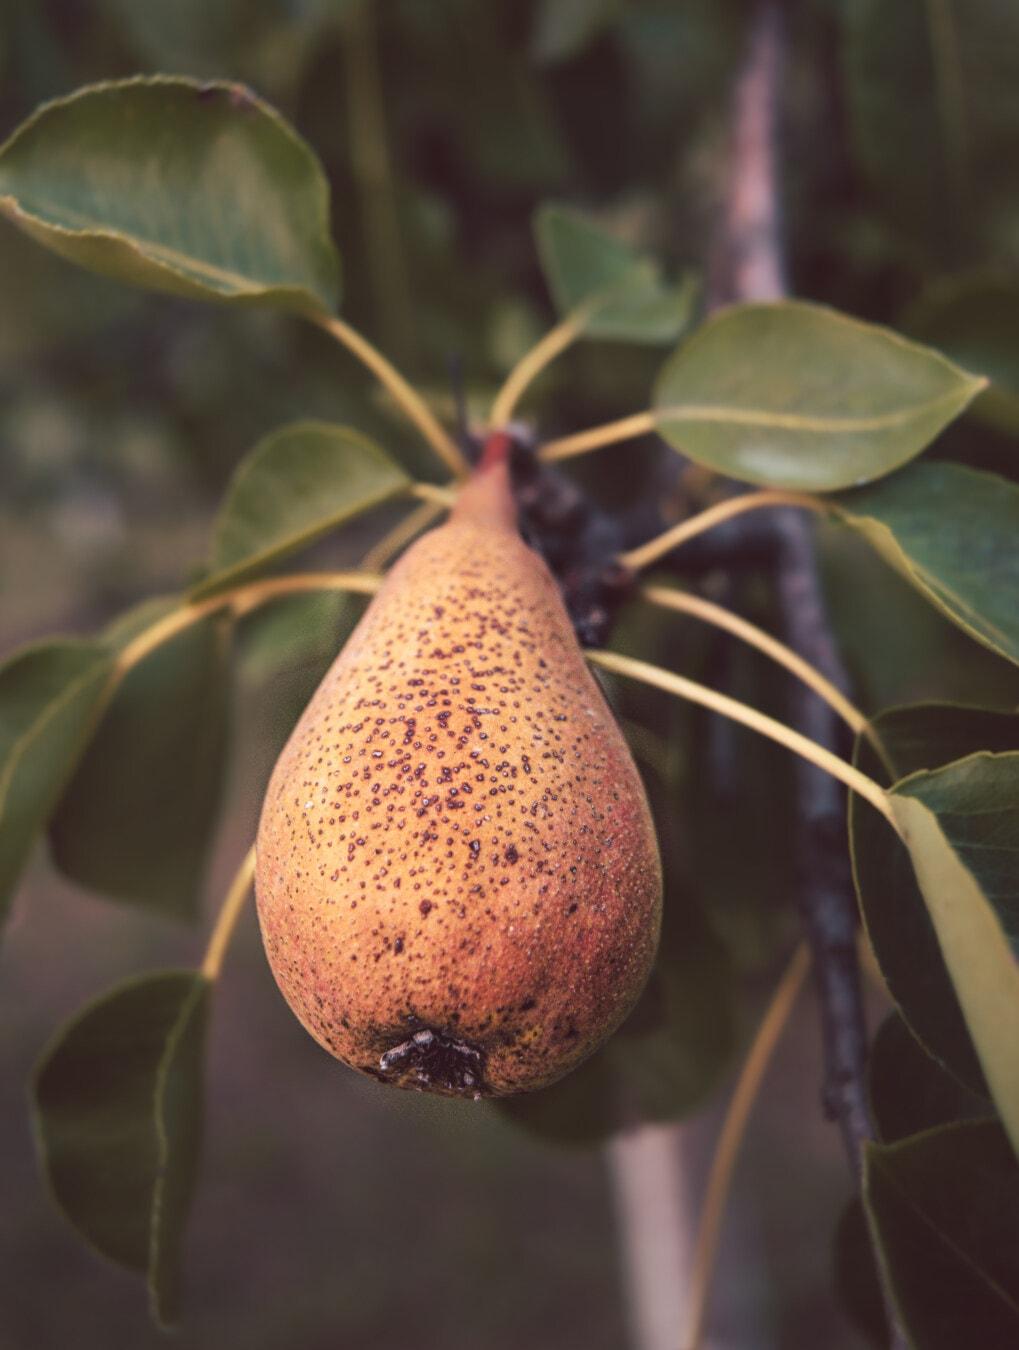 brun clair, PEAR, arbre fruitier, organique, rural, Agriculture, Agriculture, produire, alimentaire, nature